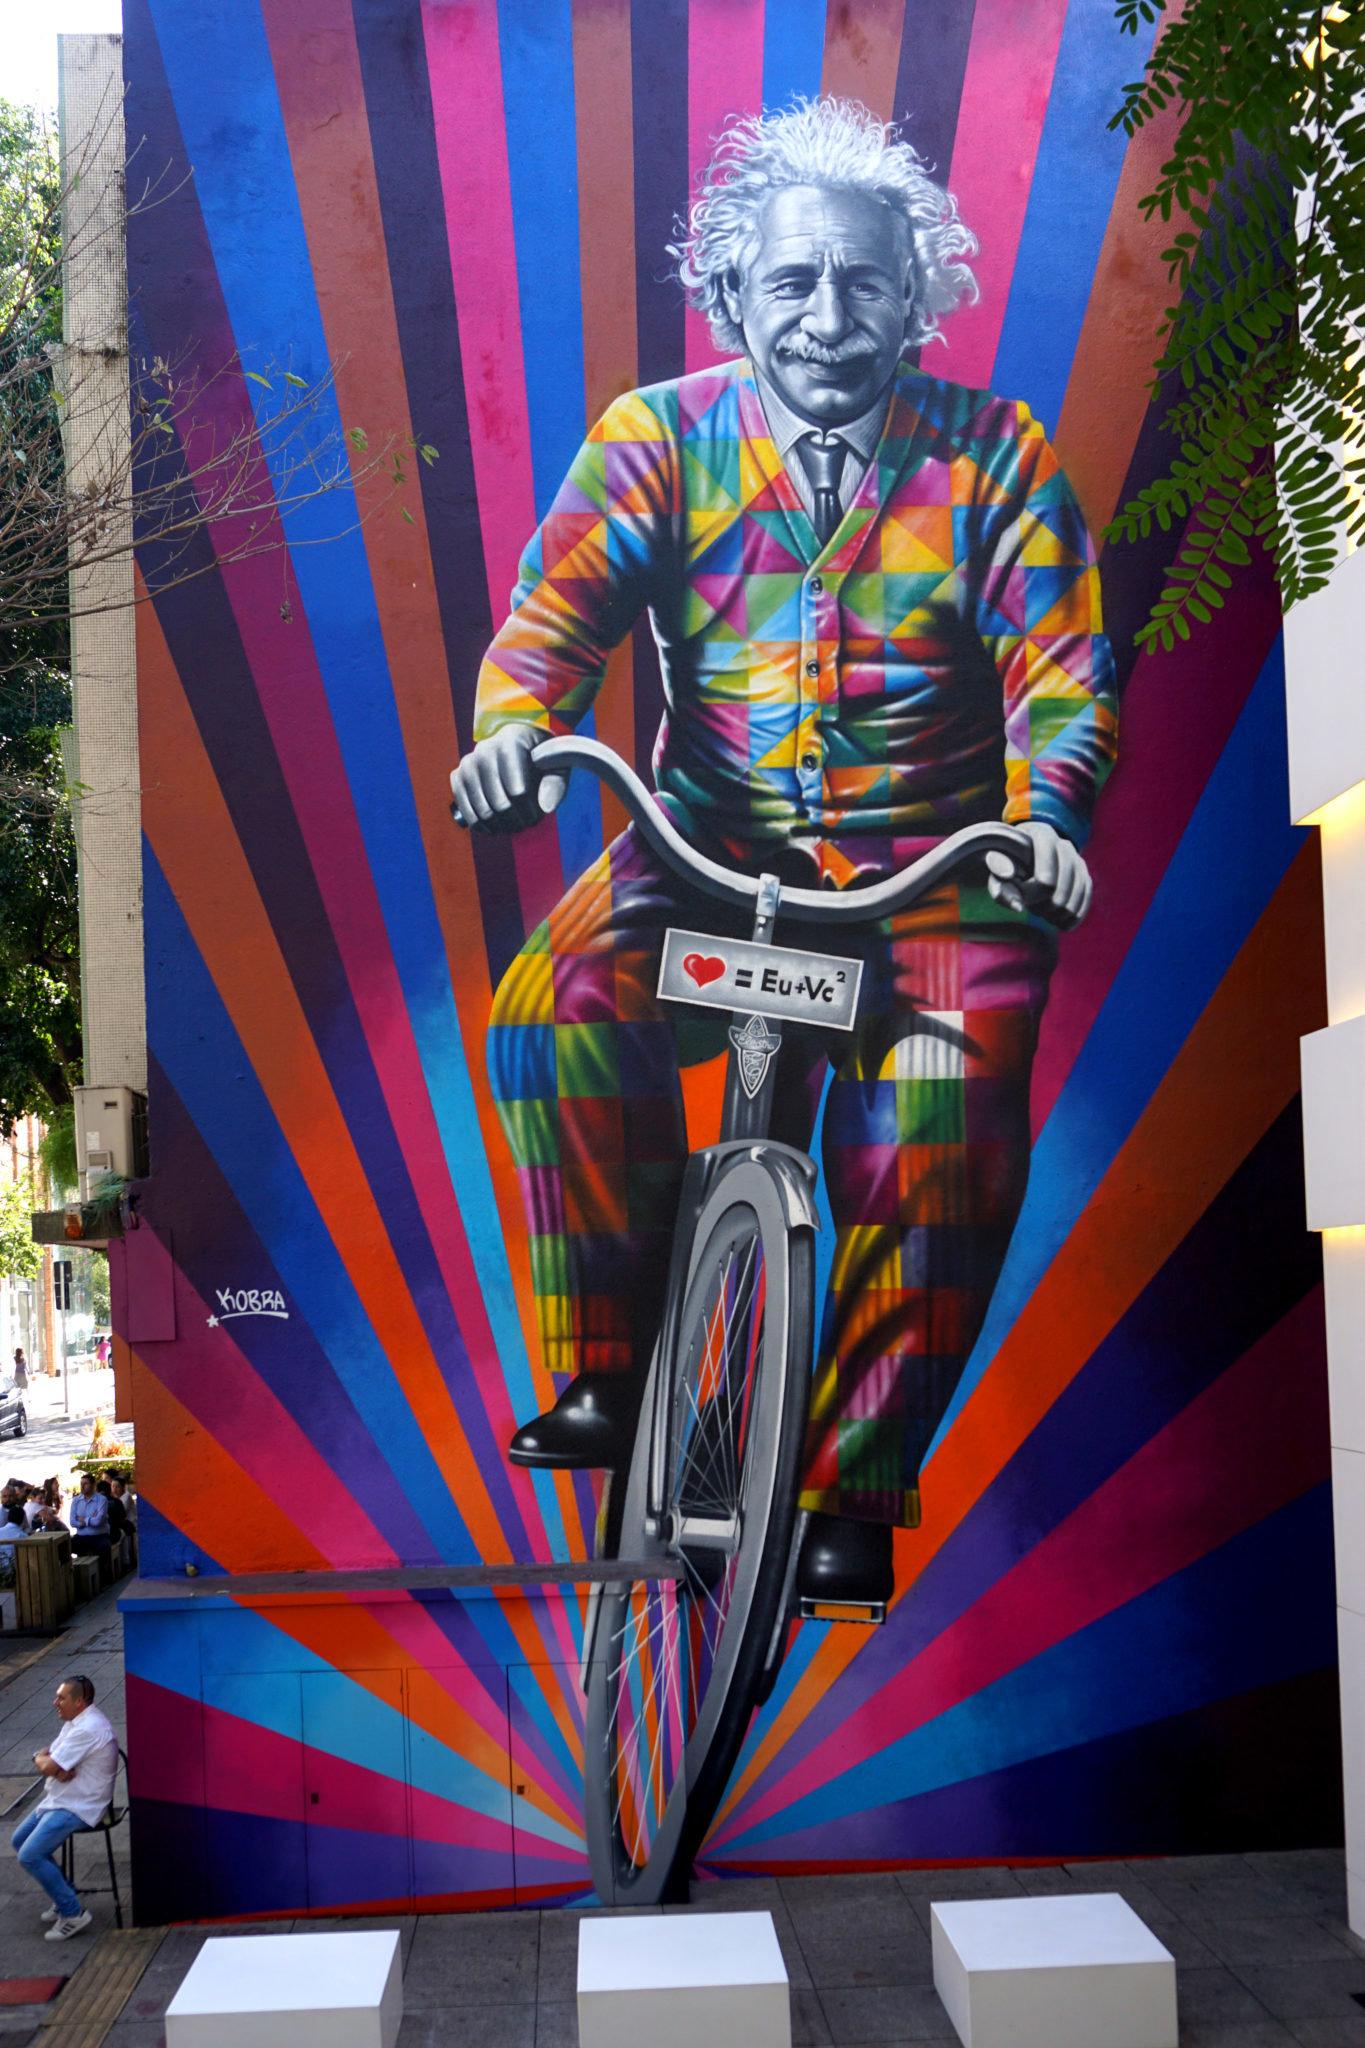 Genial Andar de Bike